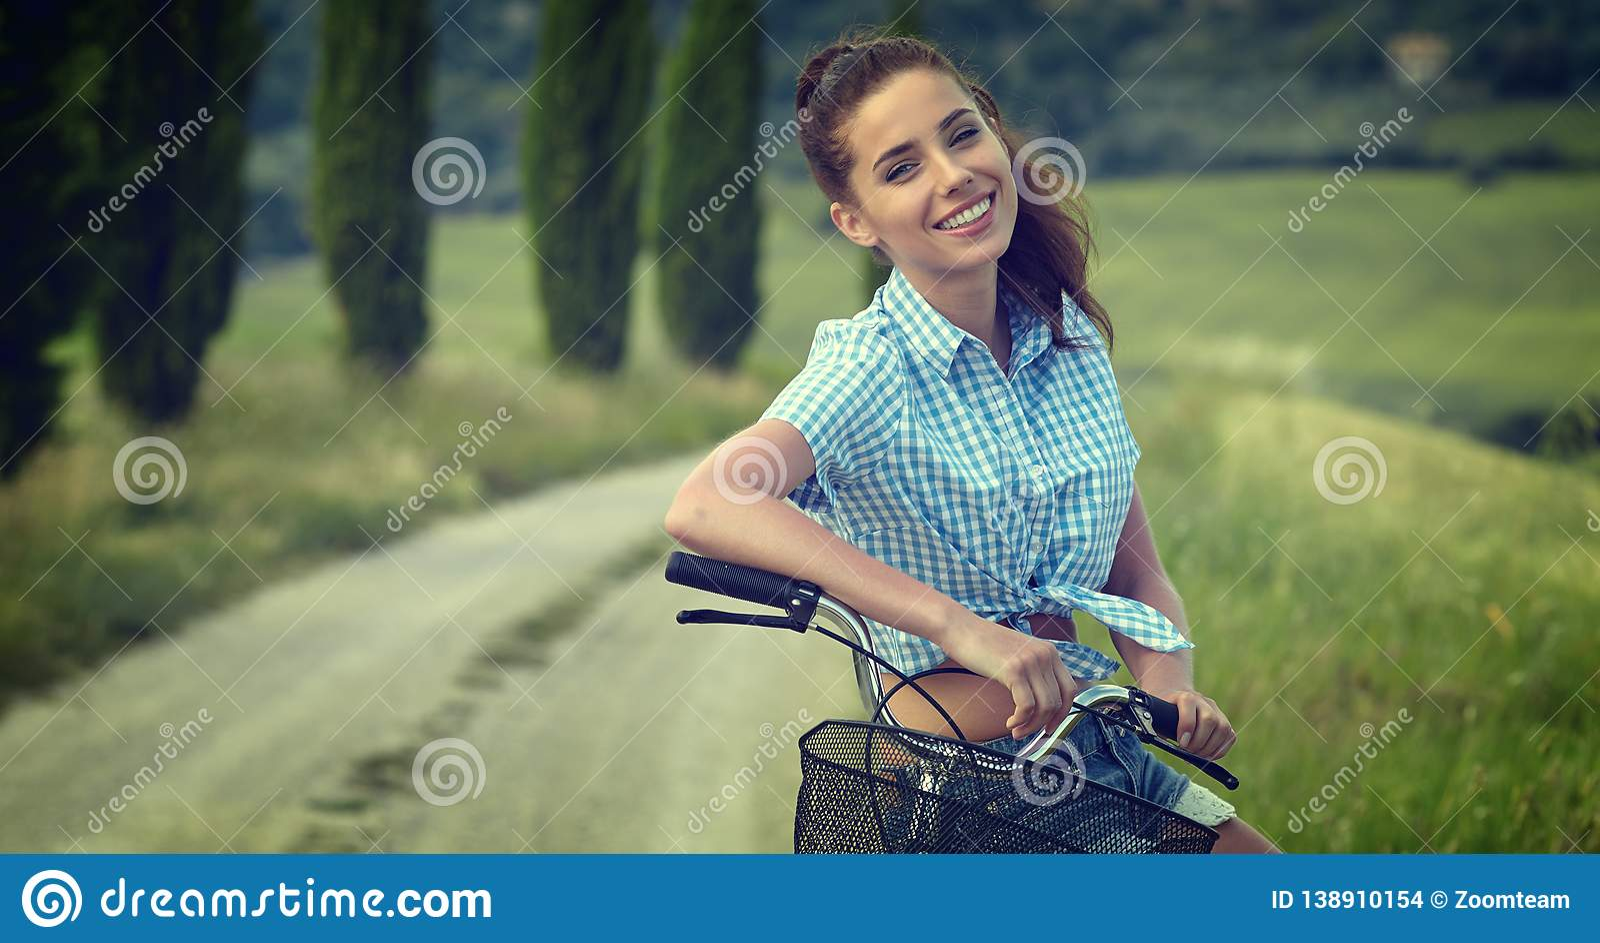 Beautiful vintage girl sitting next to bike, summer time